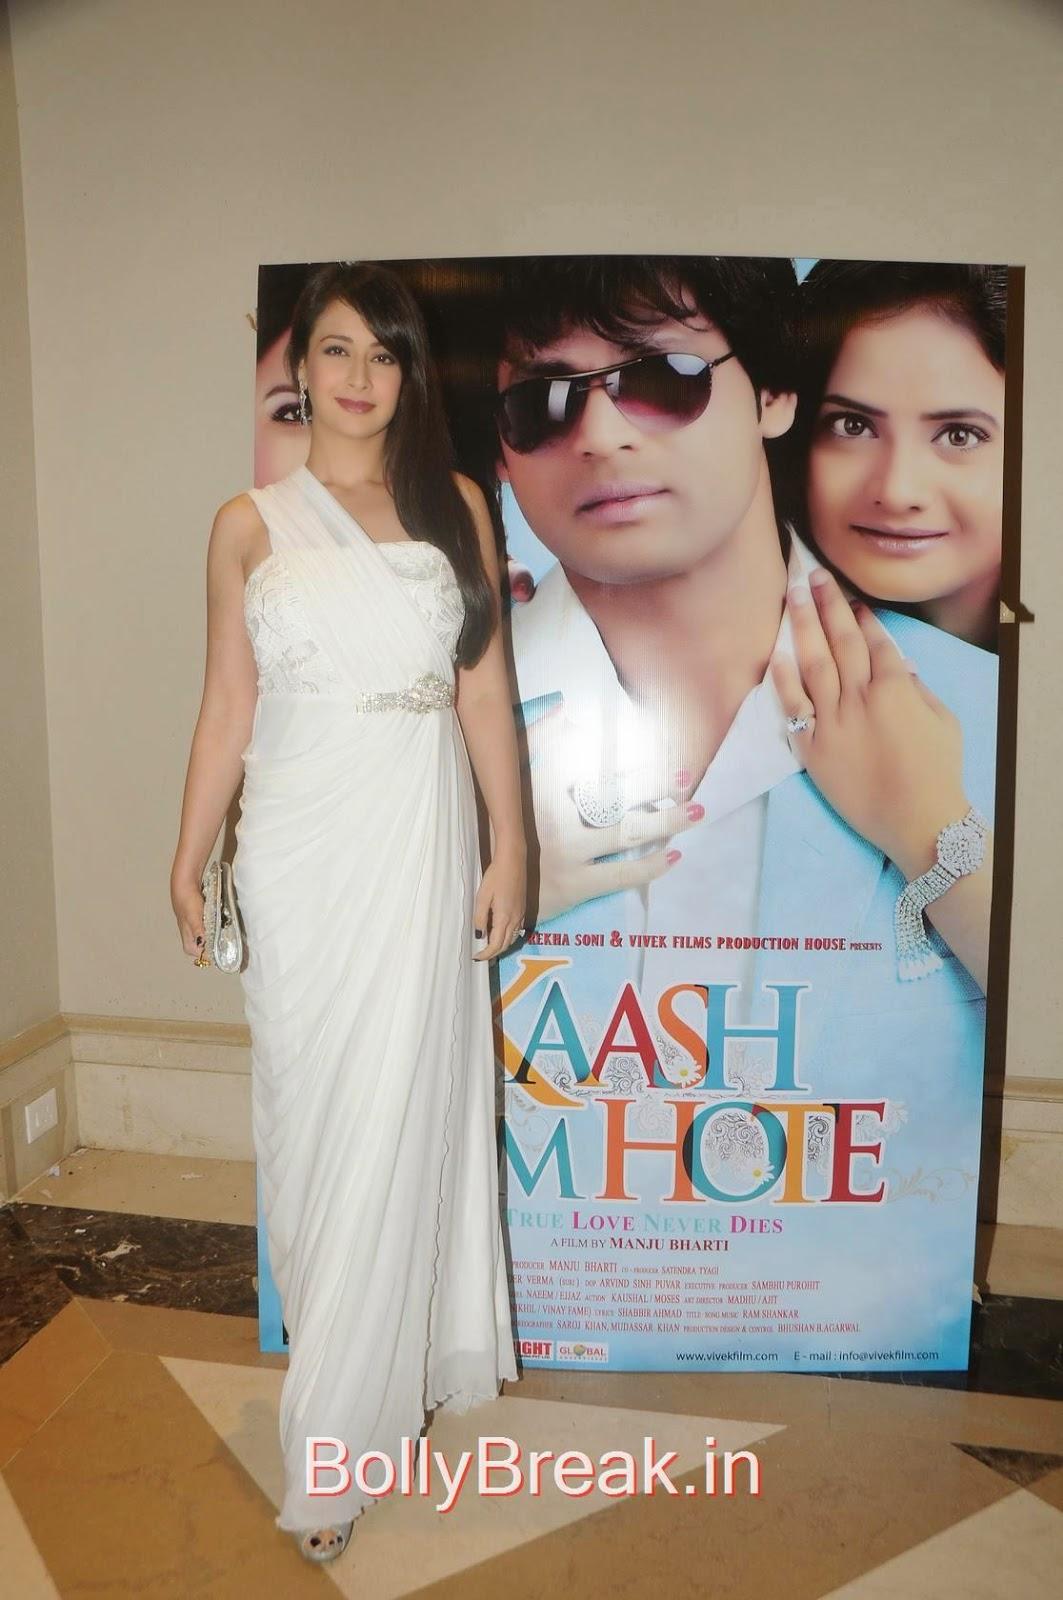 Bollywood Actress Preeti Jhangiani, Preeti Jhangiani Hot Pics in white dress from Kaash Tum Hote Trailer Launch